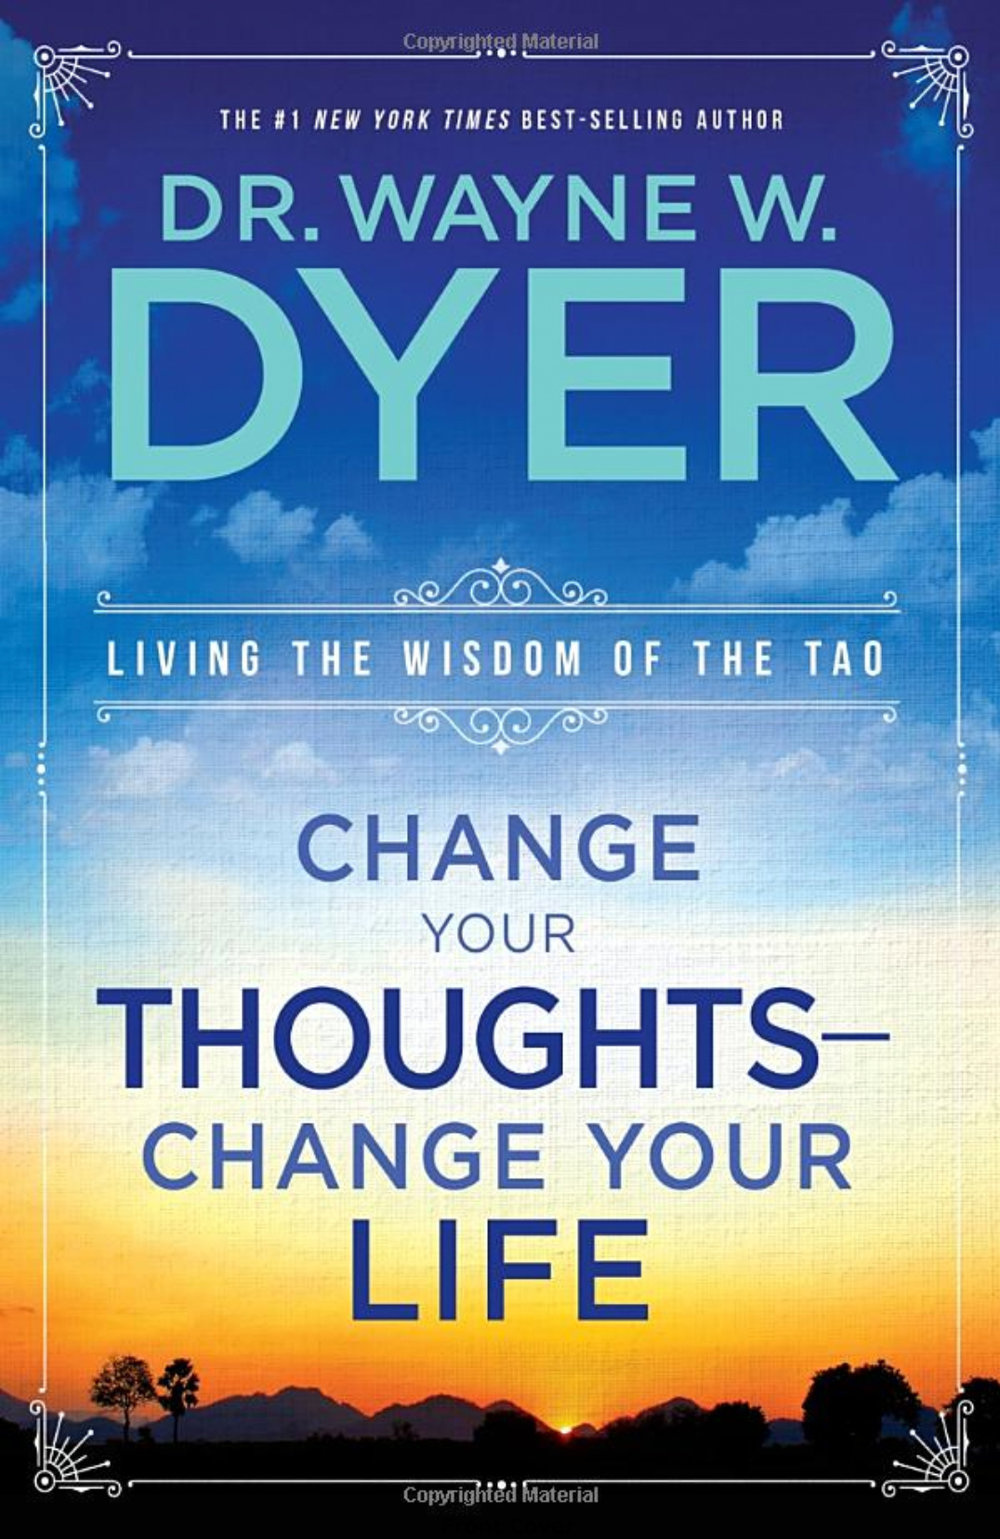 wayne dyer change your thoughts change your life.jpg